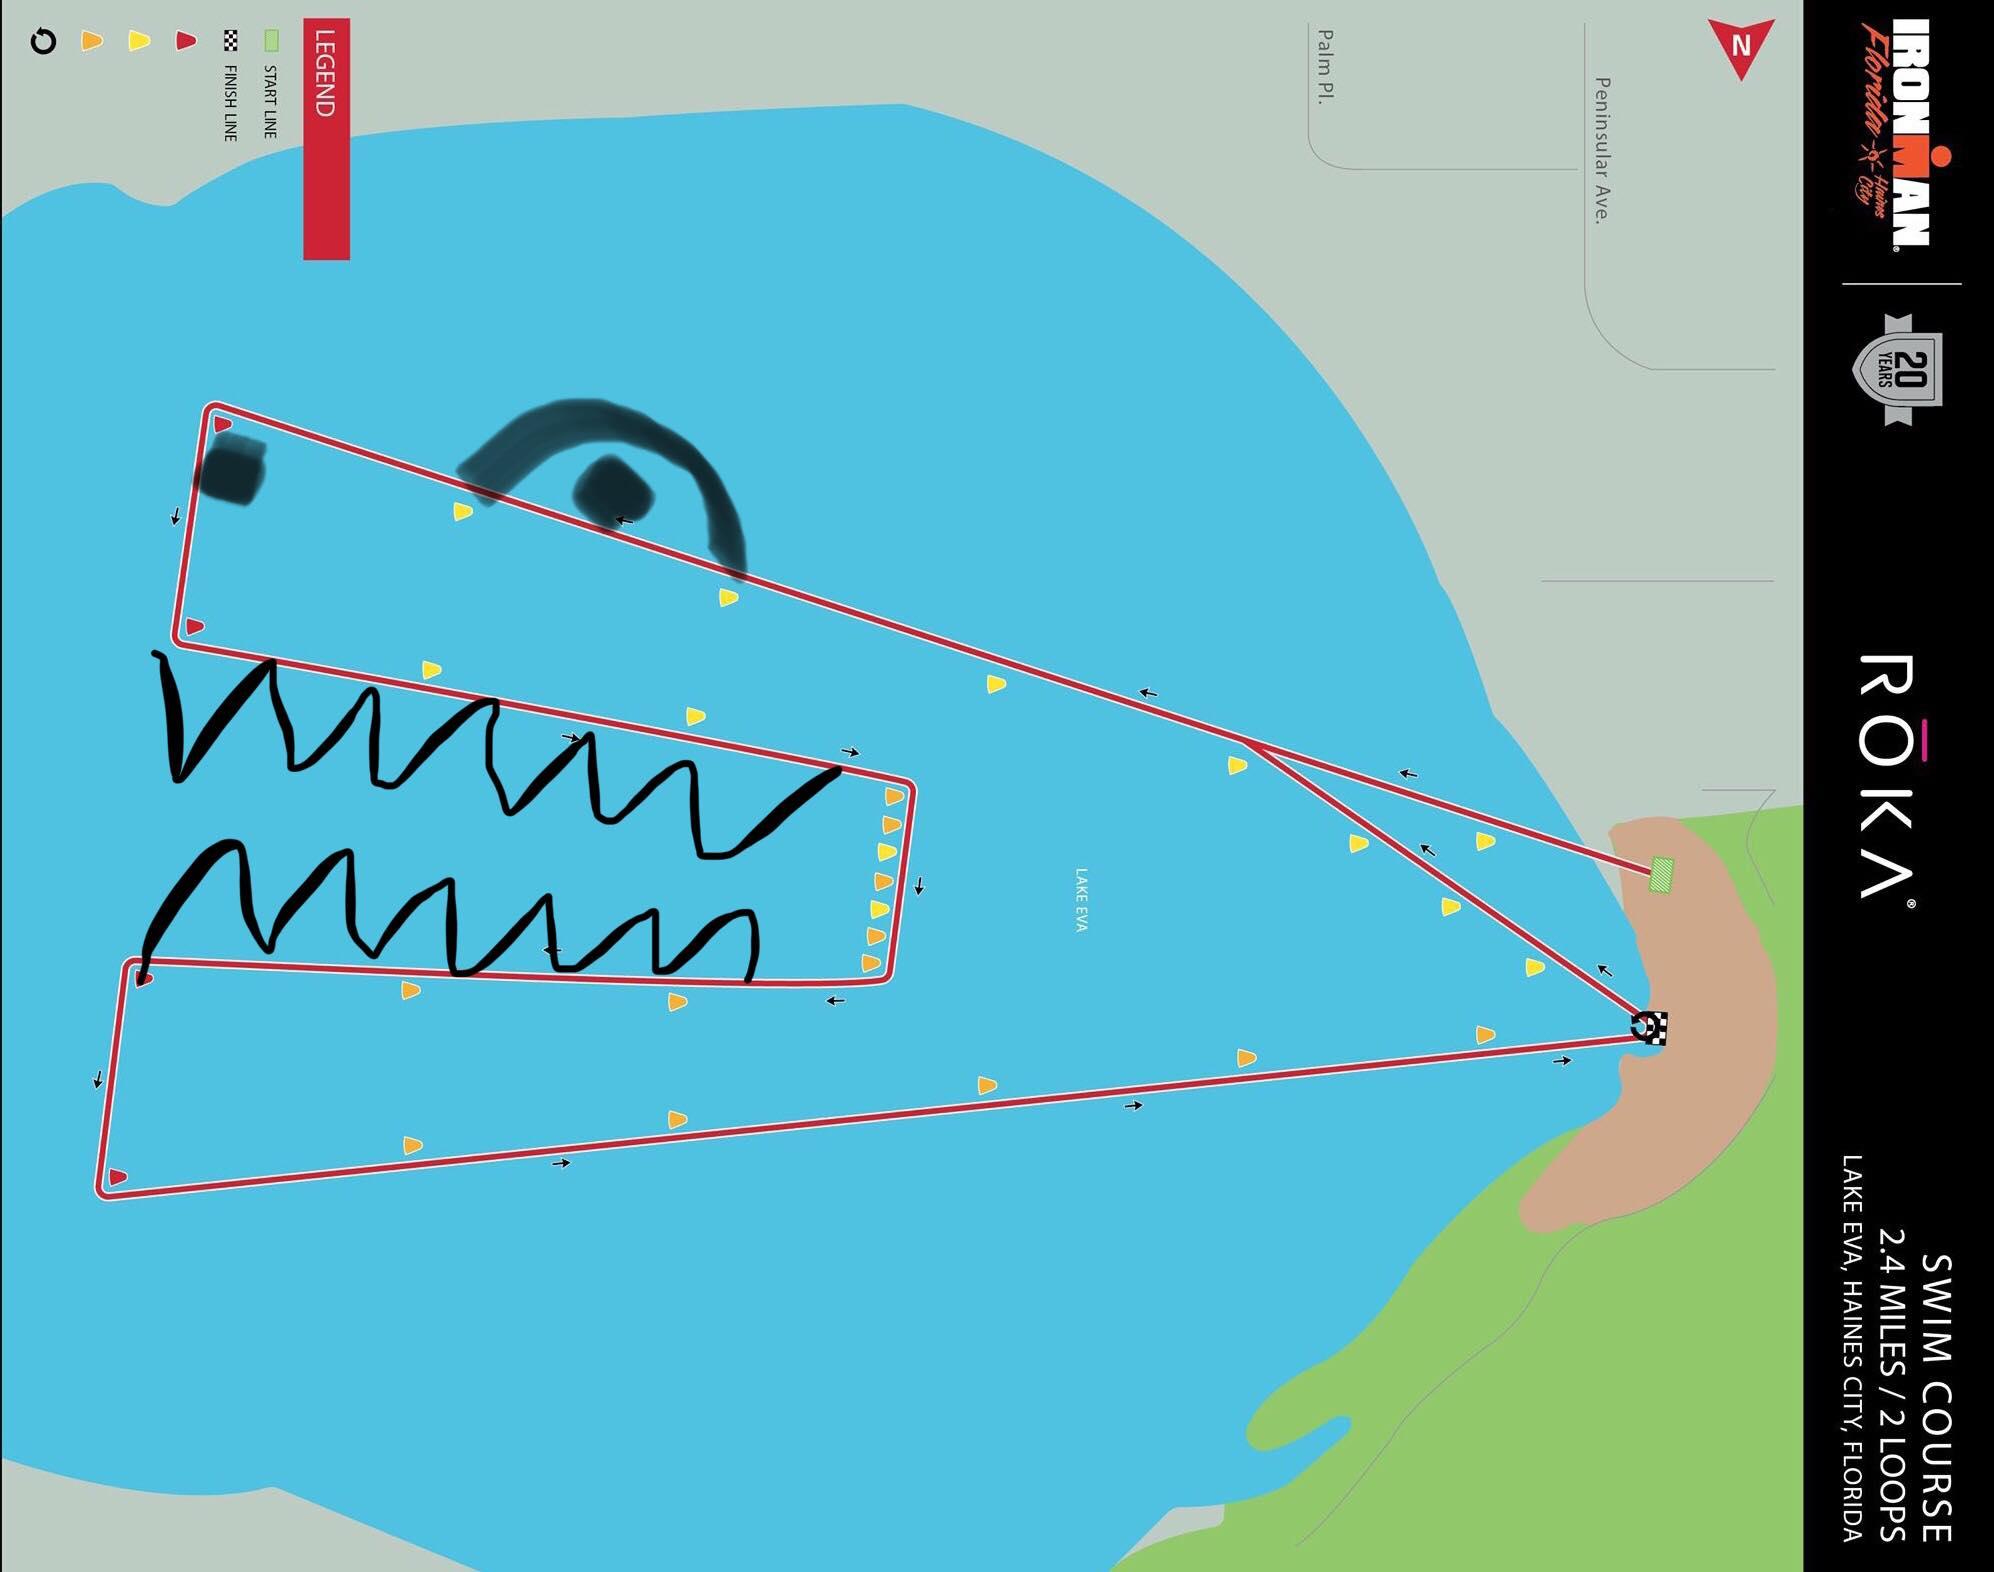 alligatorpantsswim